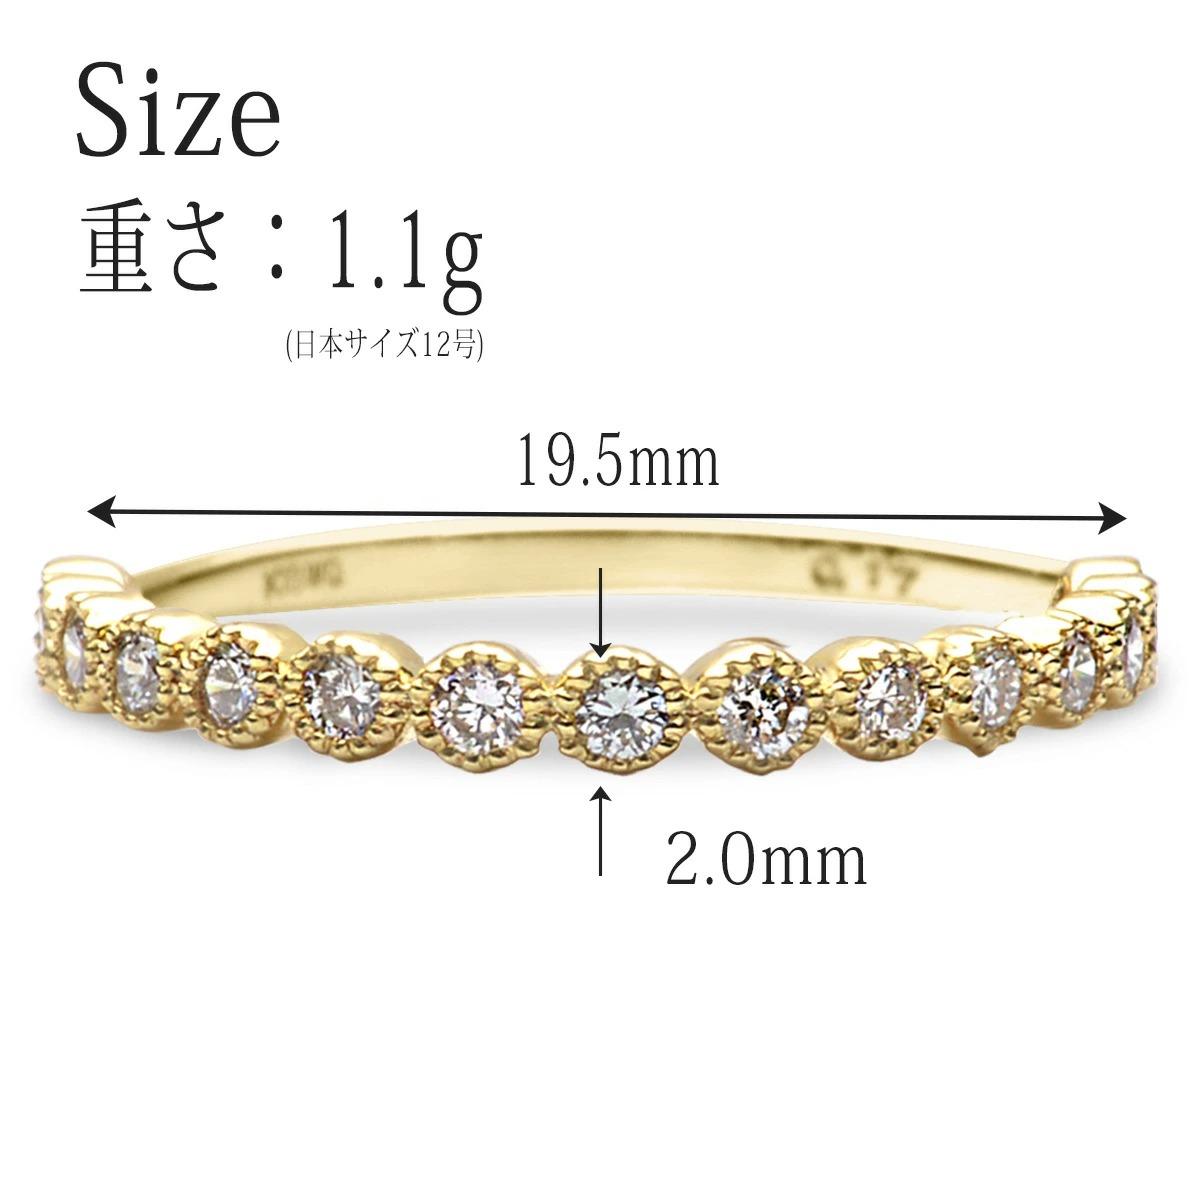 K18 ゴールド リング 指輪 ホワイトダイヤモンド ミルグレイン リング RERALUy/新作